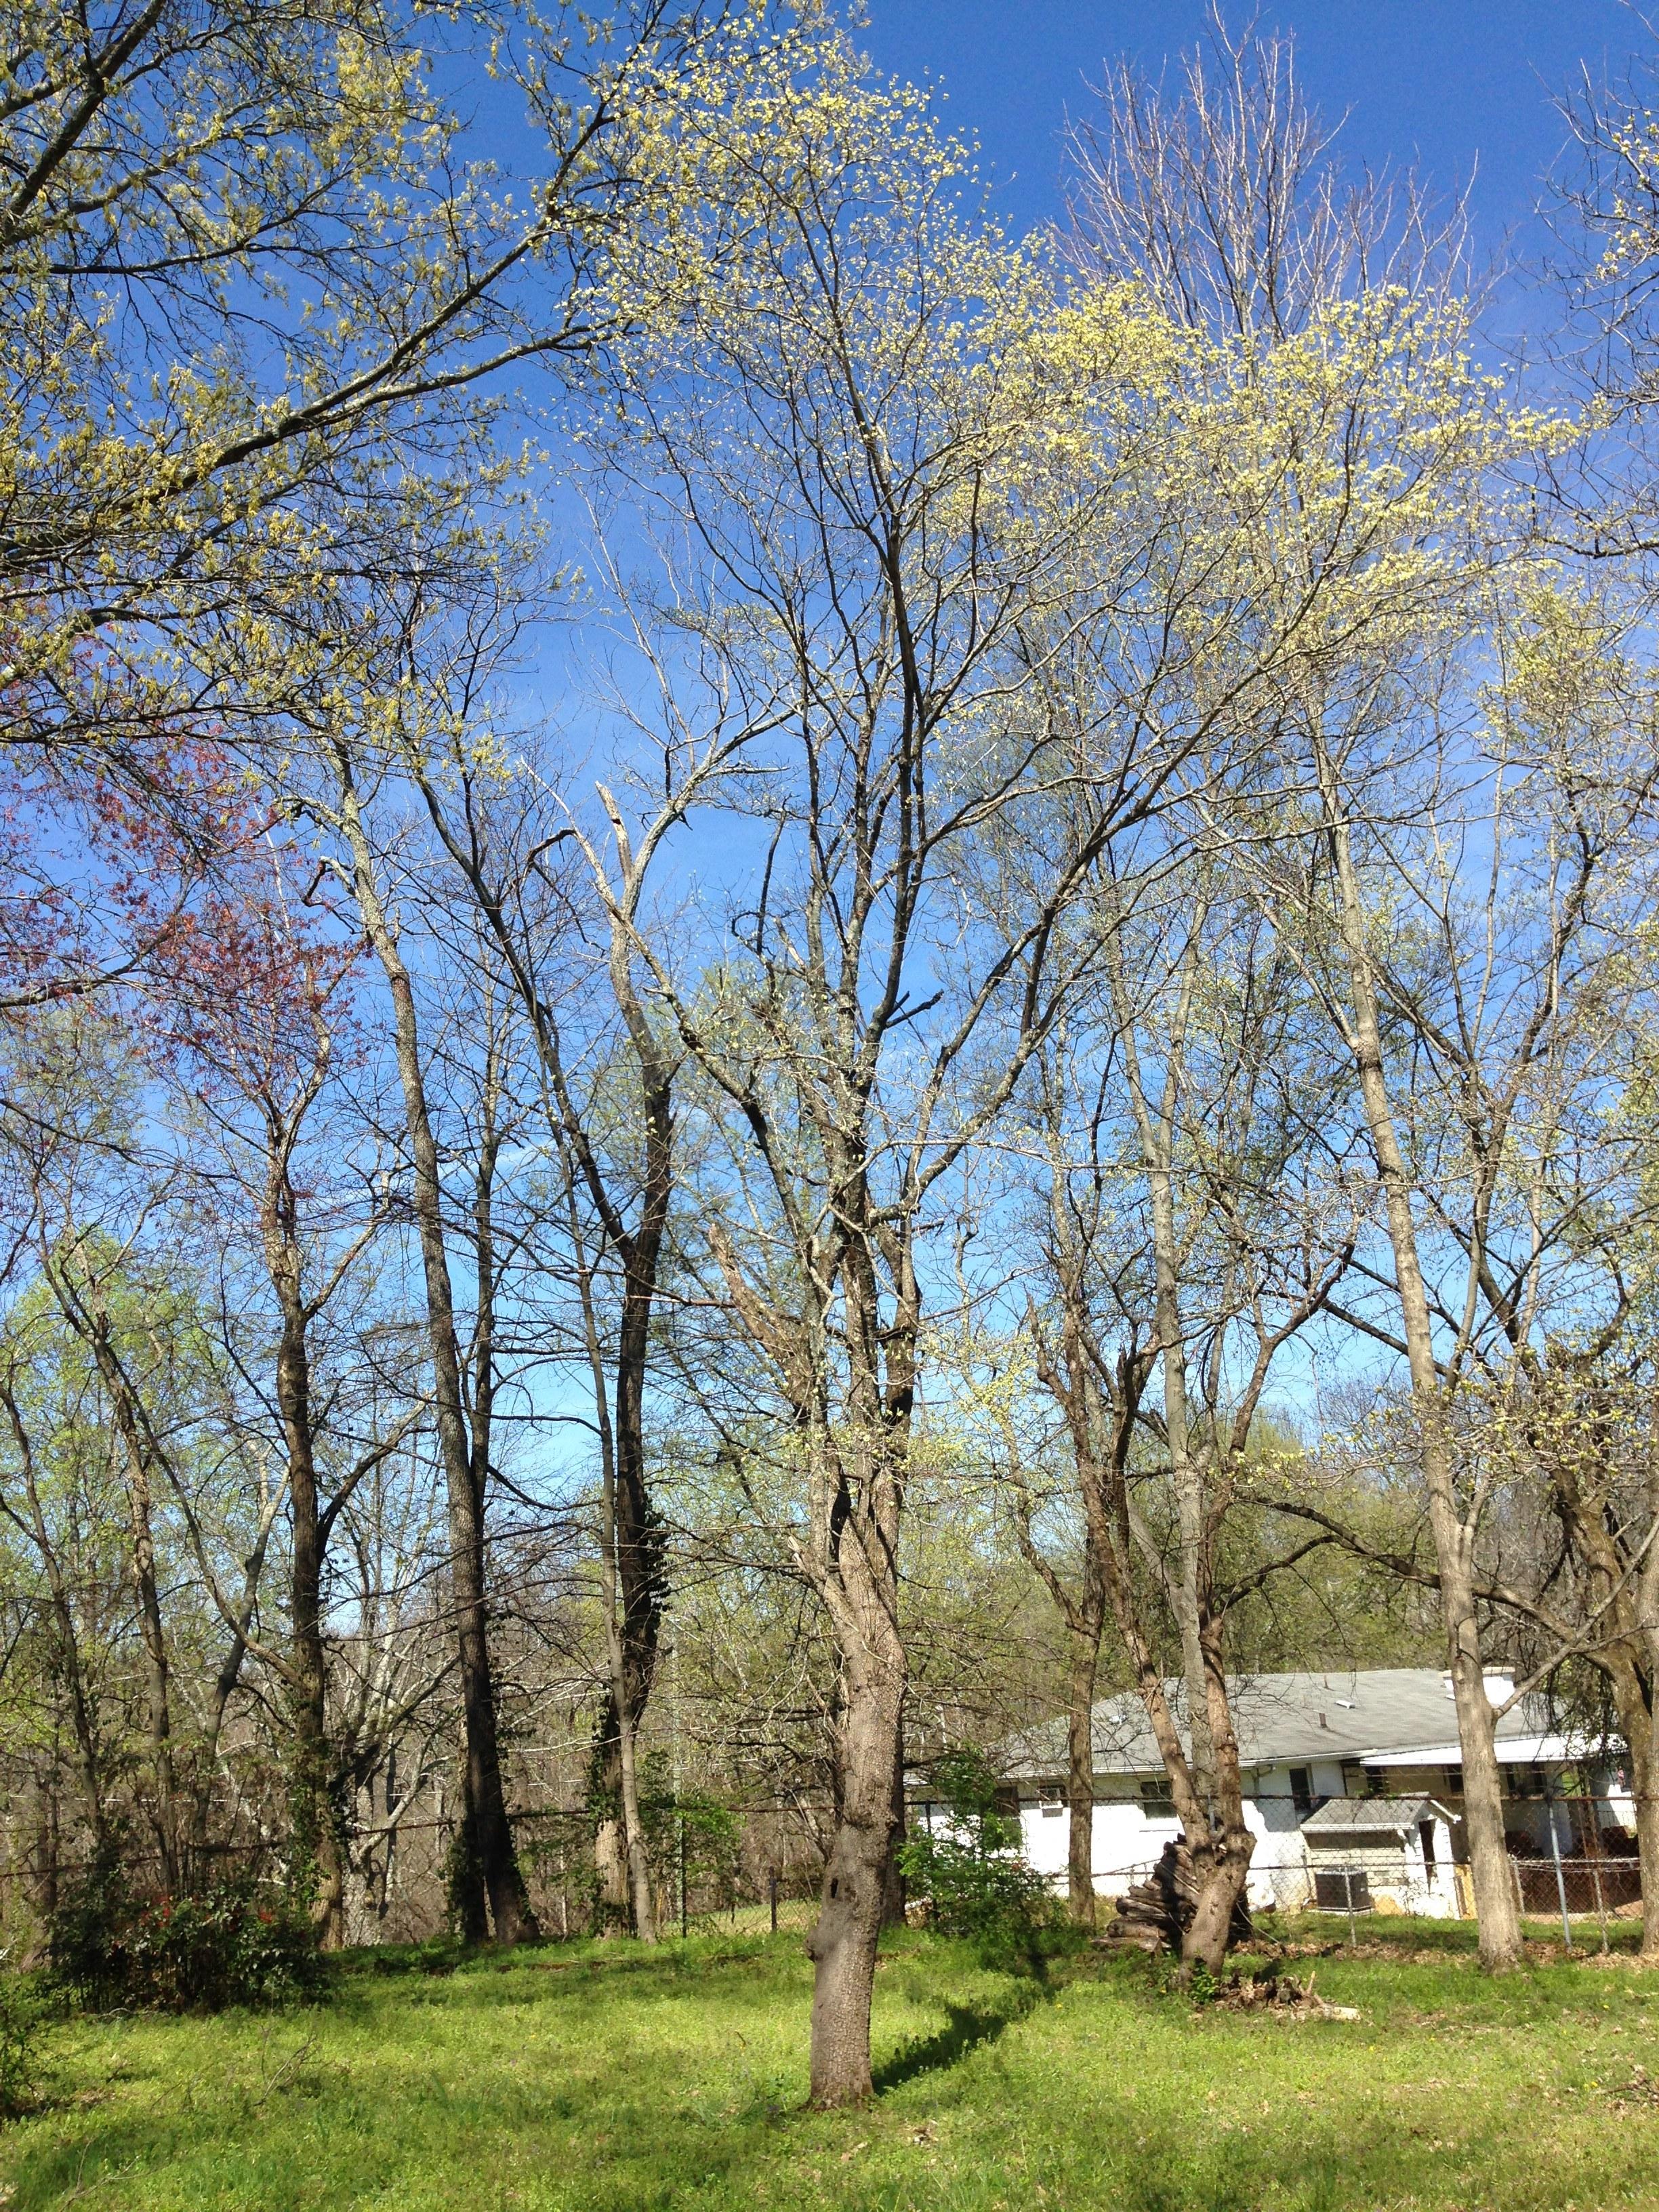 Dogwood (Cornus florida)